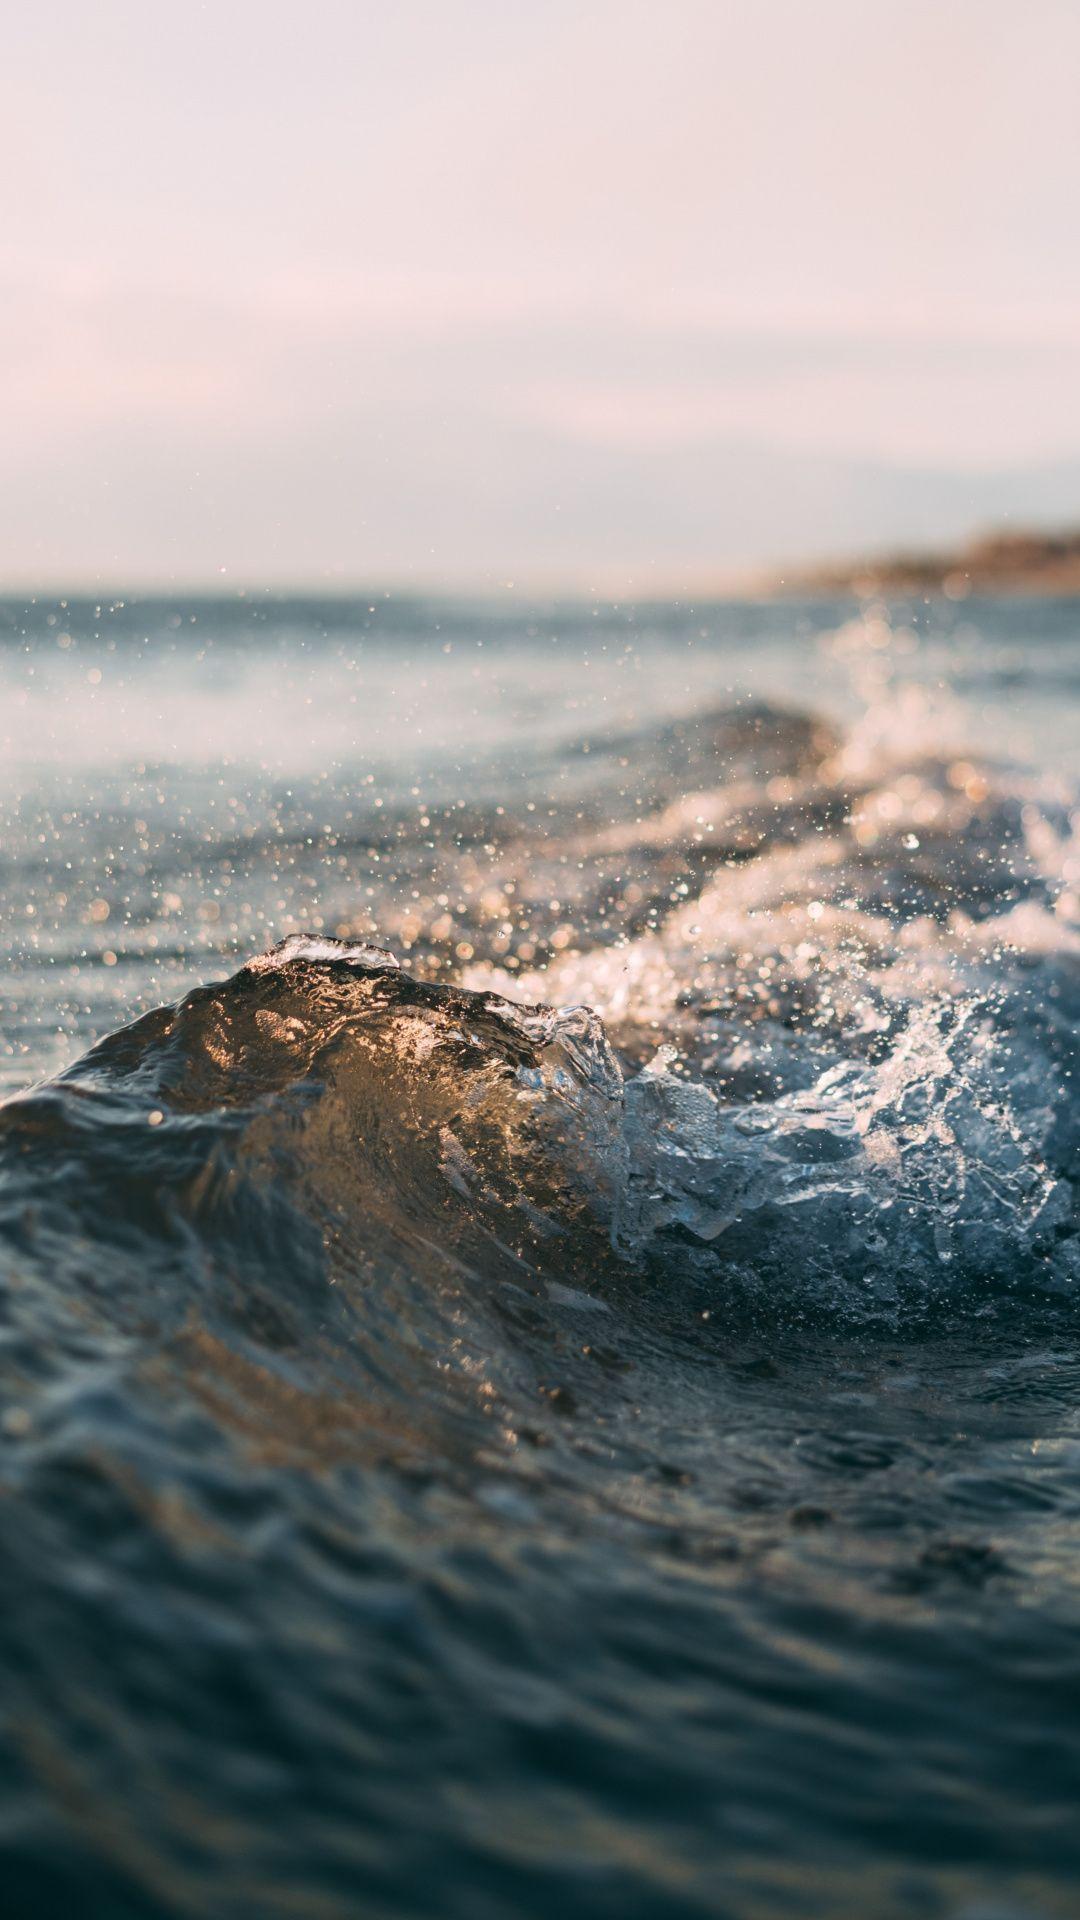 Close Up Sea Waves Body Of Water 1080x1920 Wallpaper Wohnideen Schlafzimmer Hausdekoration Ein Ocean Wallpaper Background Pictures Aesthetic Backgrounds